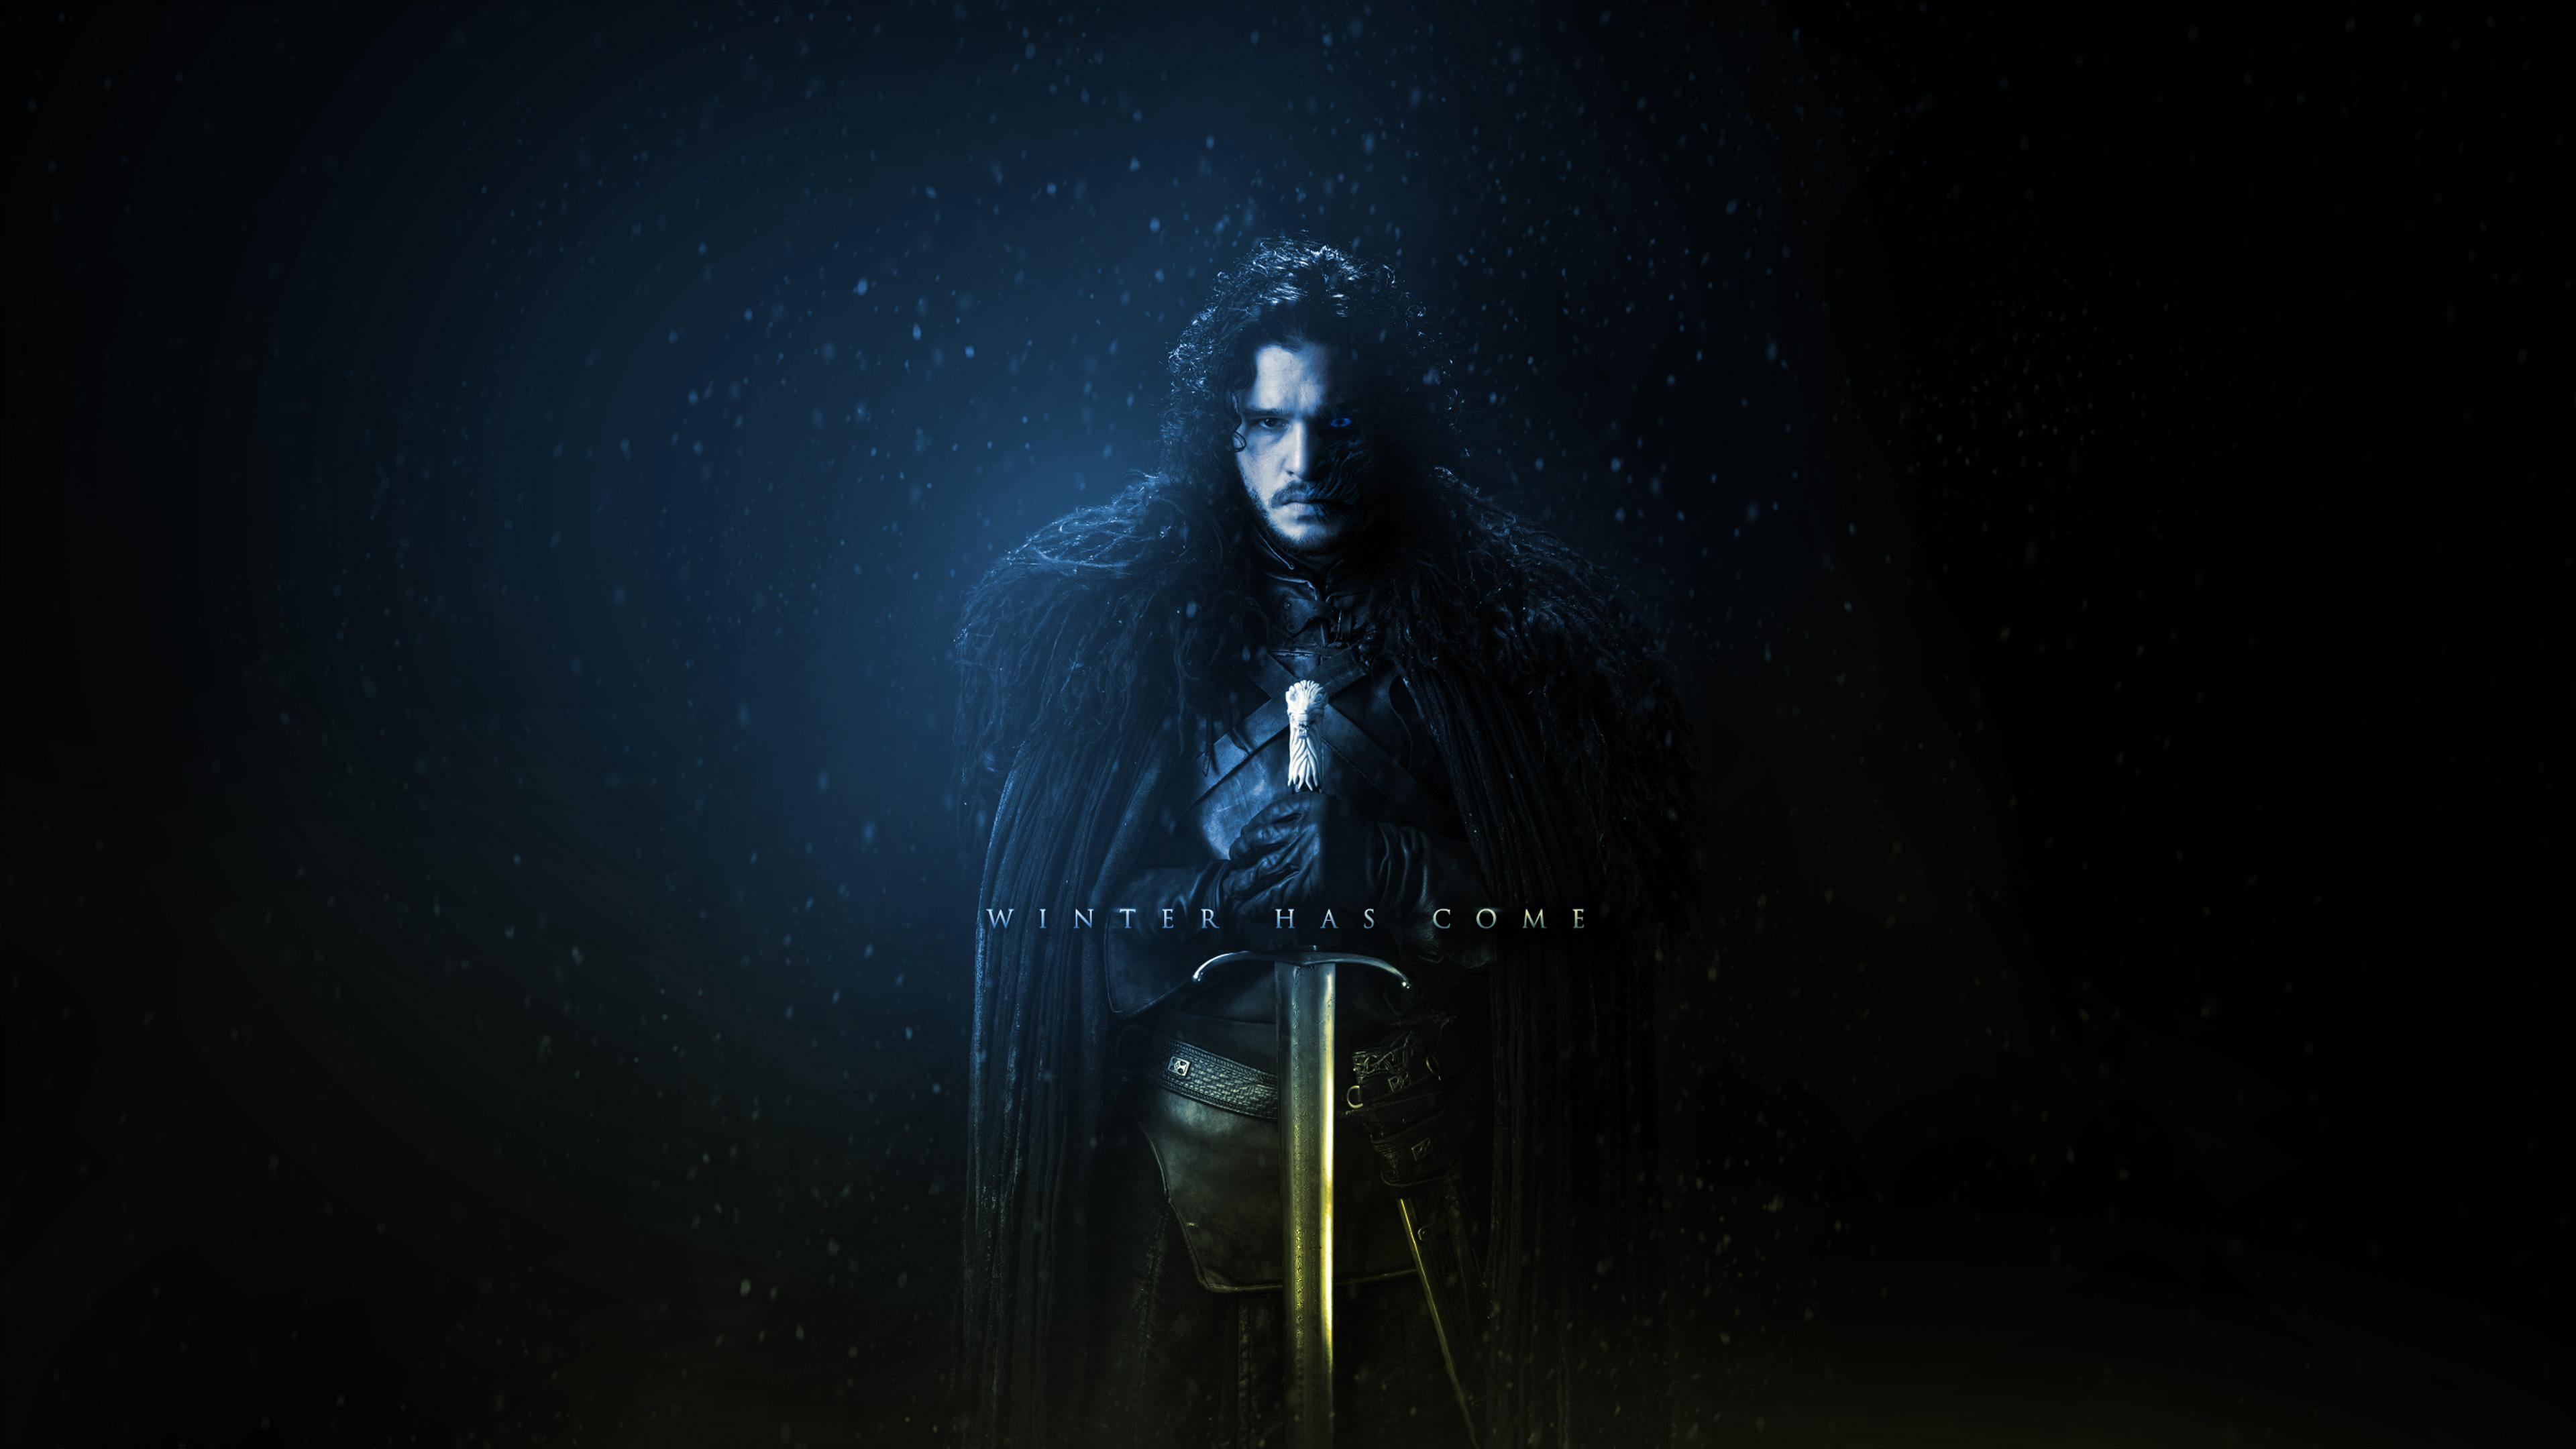 fantasy art digital art Jon Snow Game of Thrones wallpaper 3840x2160